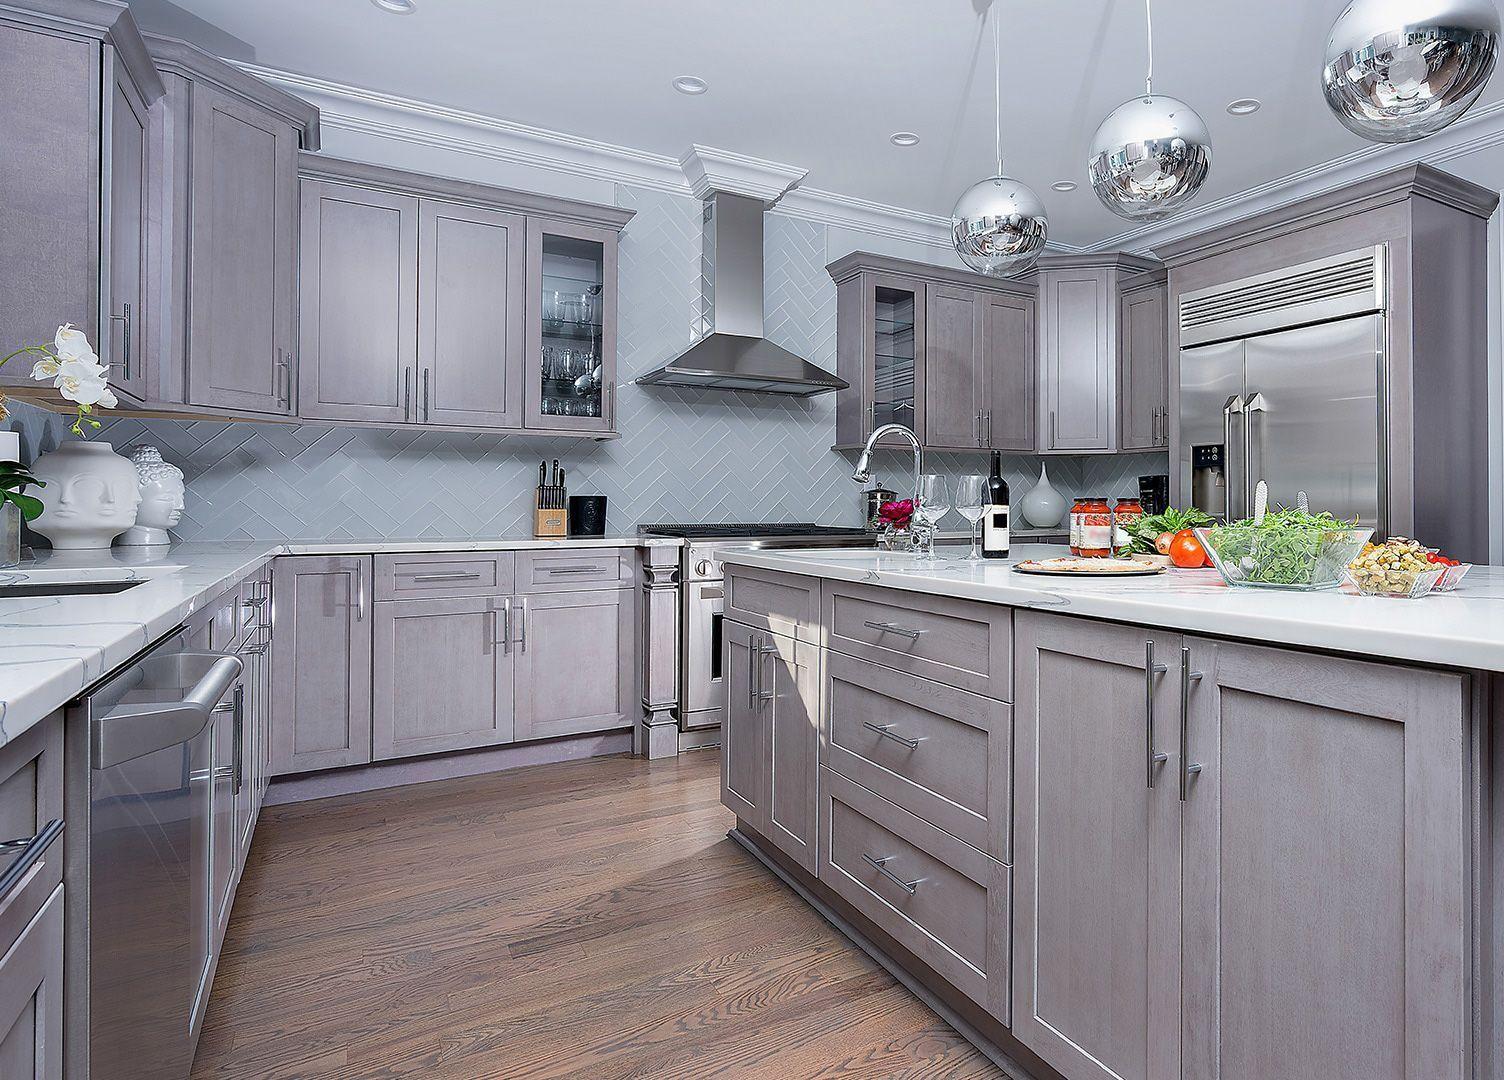 Fabuwood Allure Galaxy Horizon 10 X 10 Kitchen 10 X 10 Kitchen Cabinets Kitchen Cabinets Kitche Kitchen Cabinets Industrial Style Kitchen Kitchen Remodel